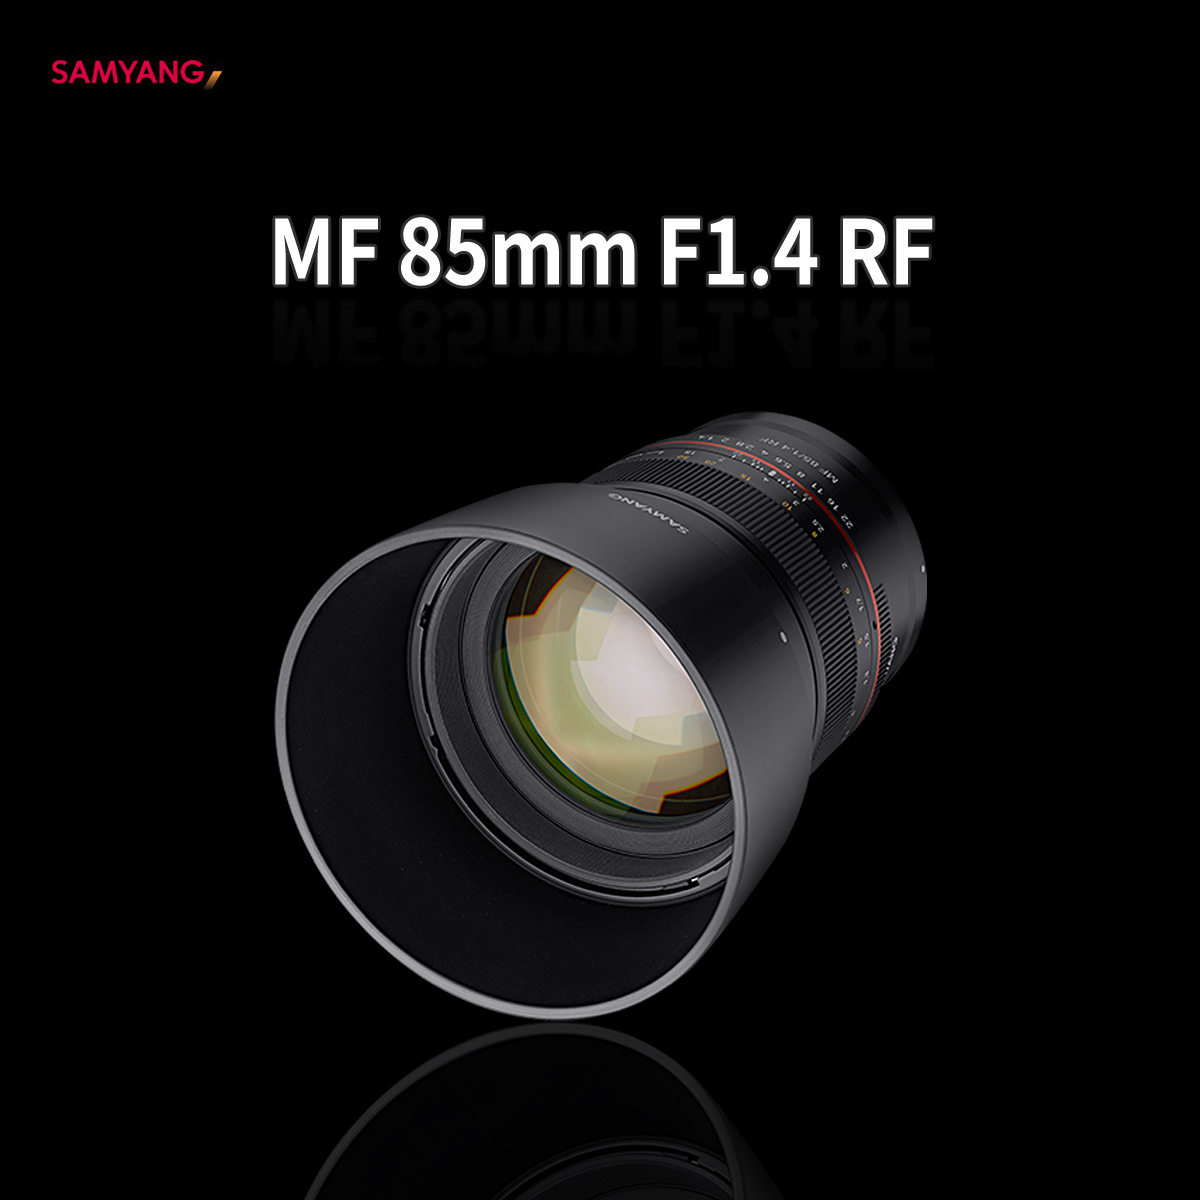 samyang_MF85mm_F1.4_RF